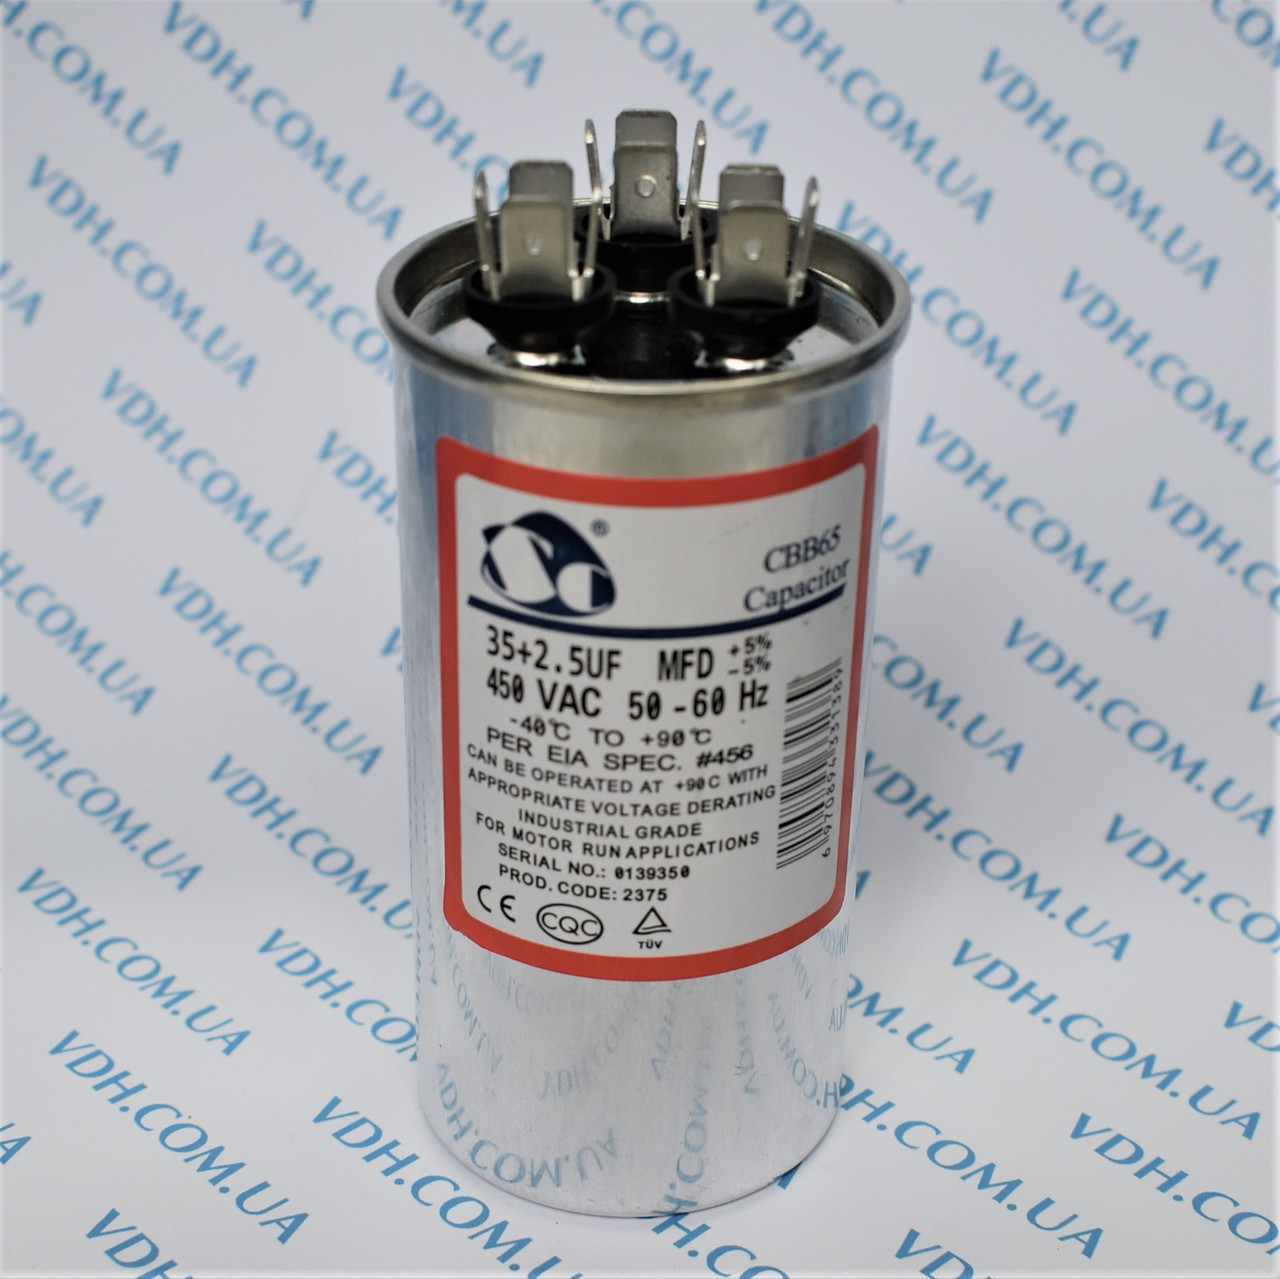 Електричний конденсатор 60 + 2,5 мкФ